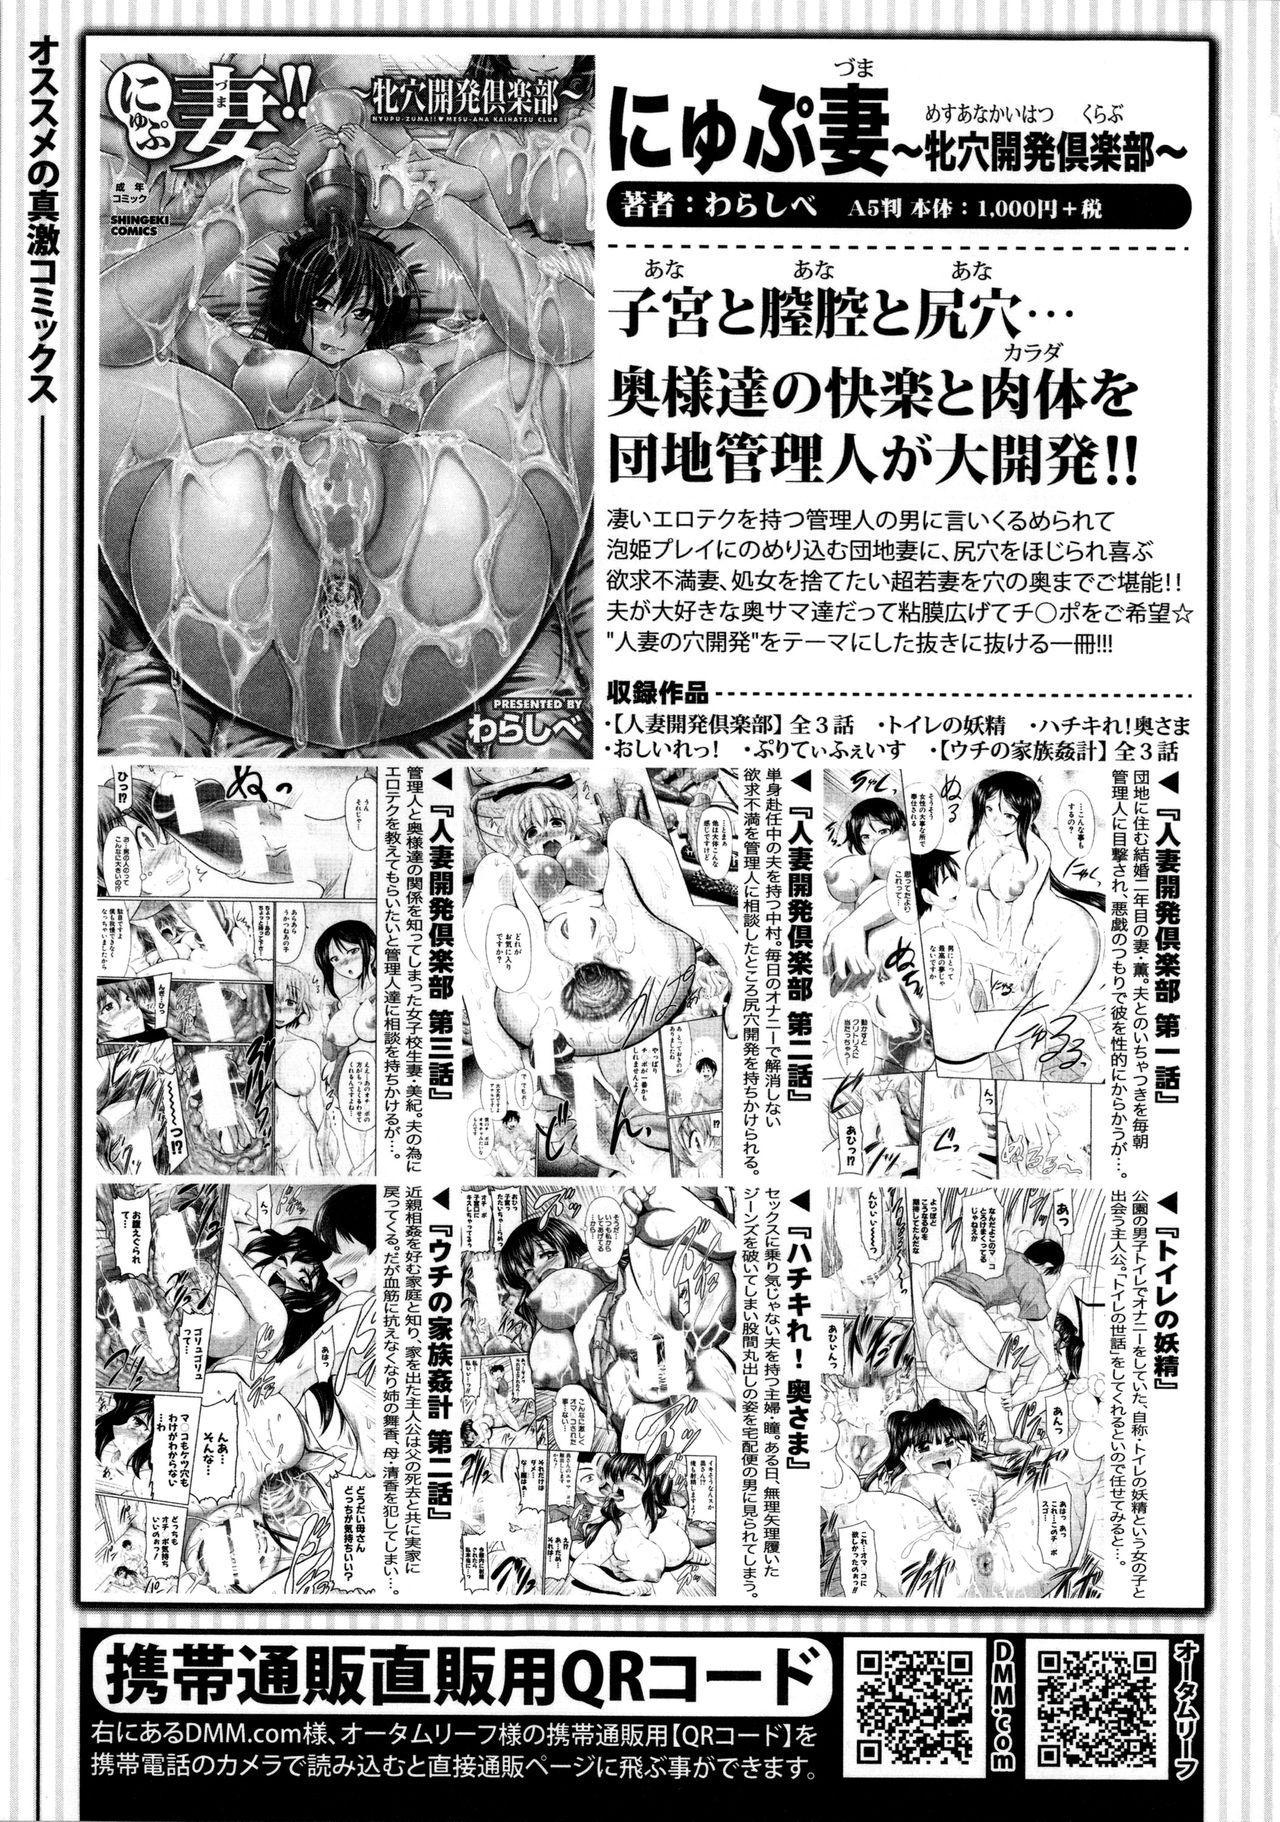 [Yoshimura Tatsumaki] Monzetsu Taigatame ~Count 3 de Ikasete Ageru~ | Faint in Agony Bodylock ~I'll make you cum on the count of 3~ [English] [Brolen] 232